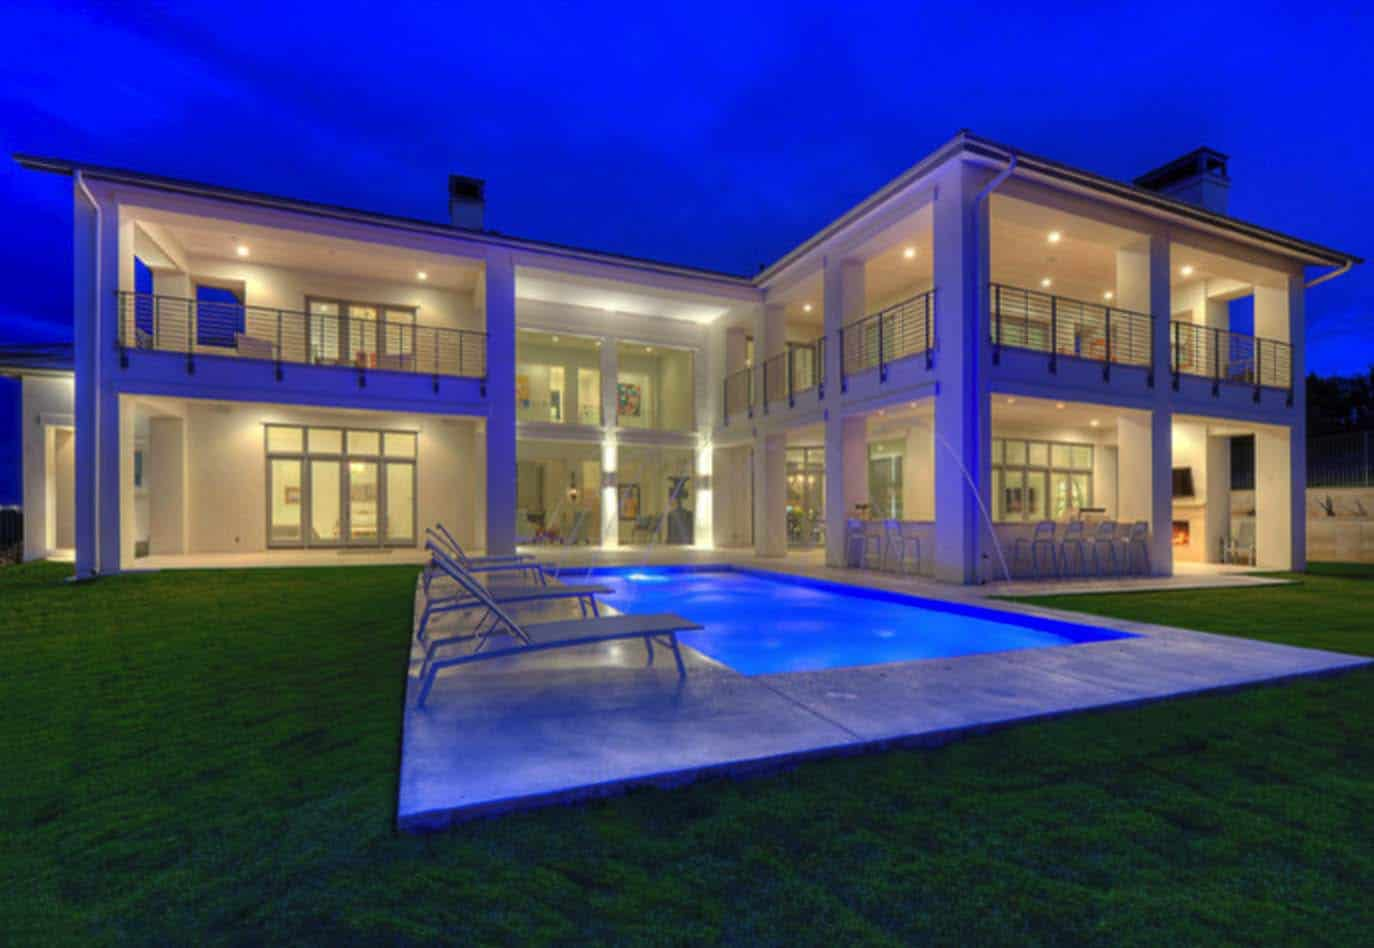 Coastal Contemporary Home-Cornerstone Architects-16-1 Kindesign